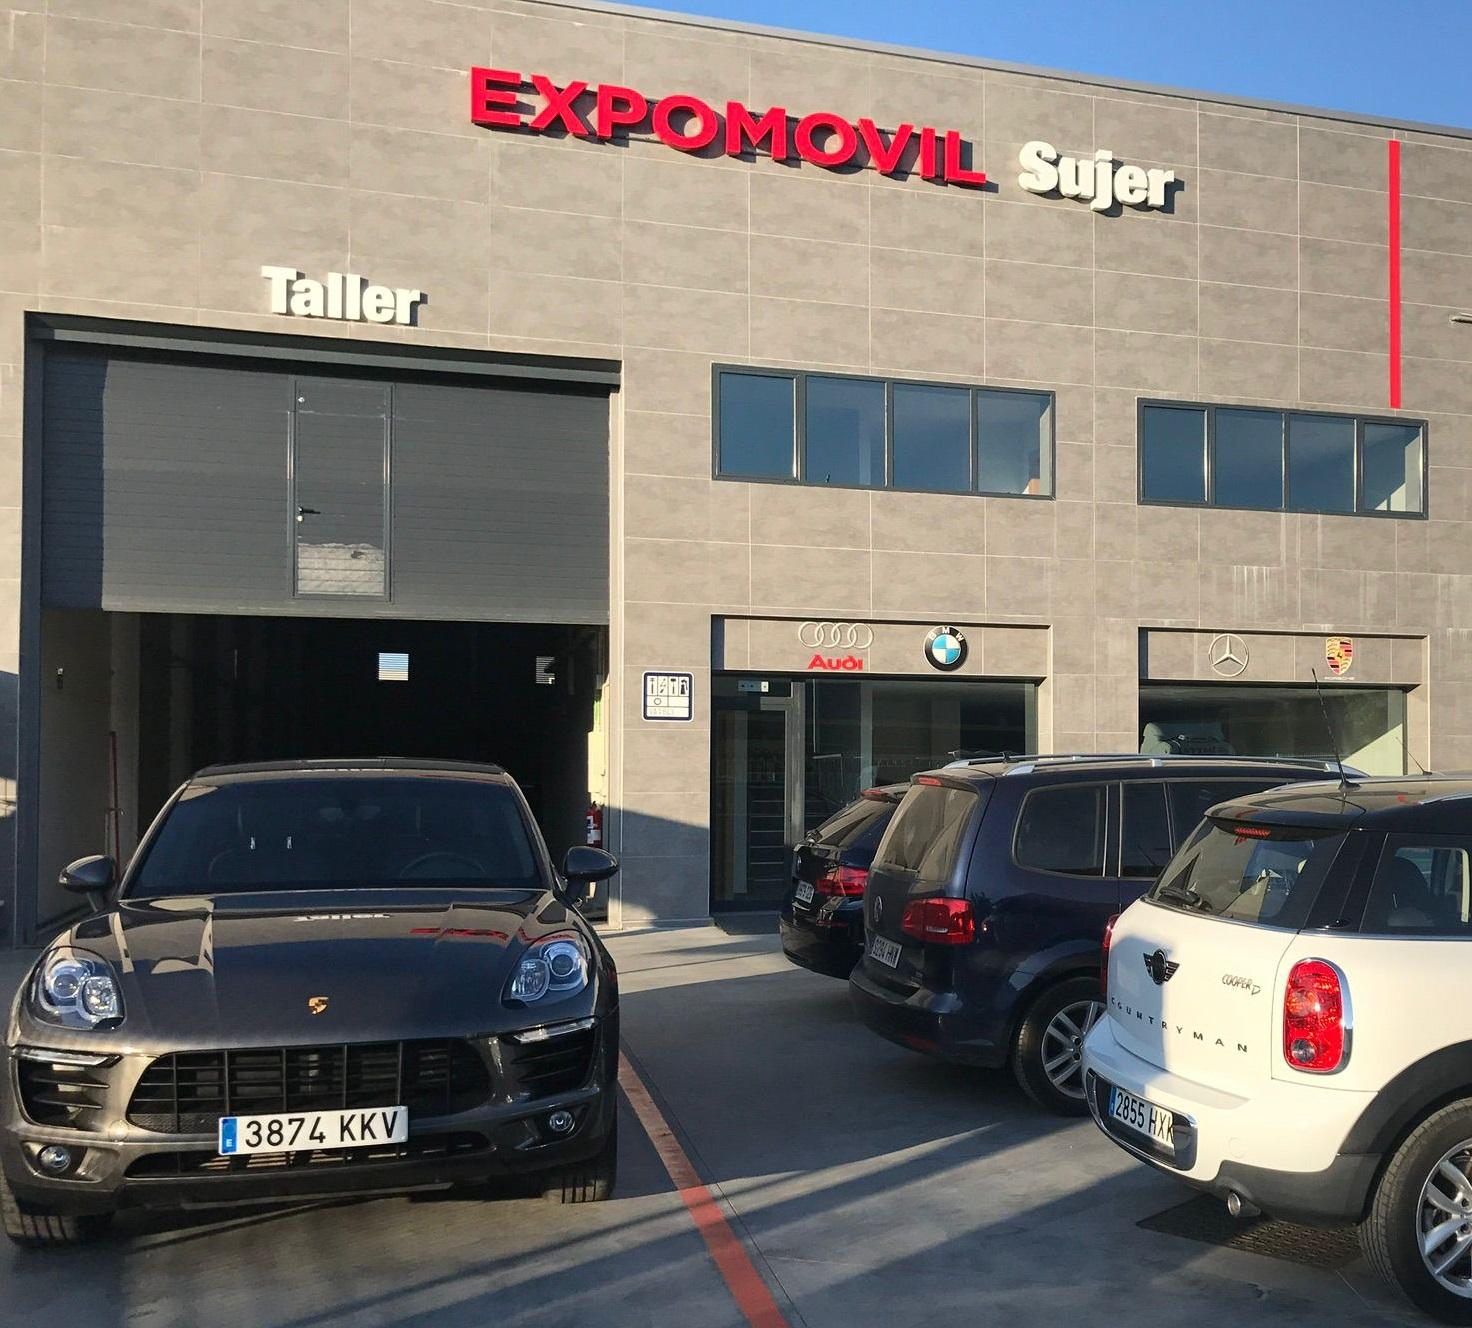 taller-de-coches-expomovil-sujer-valladolid